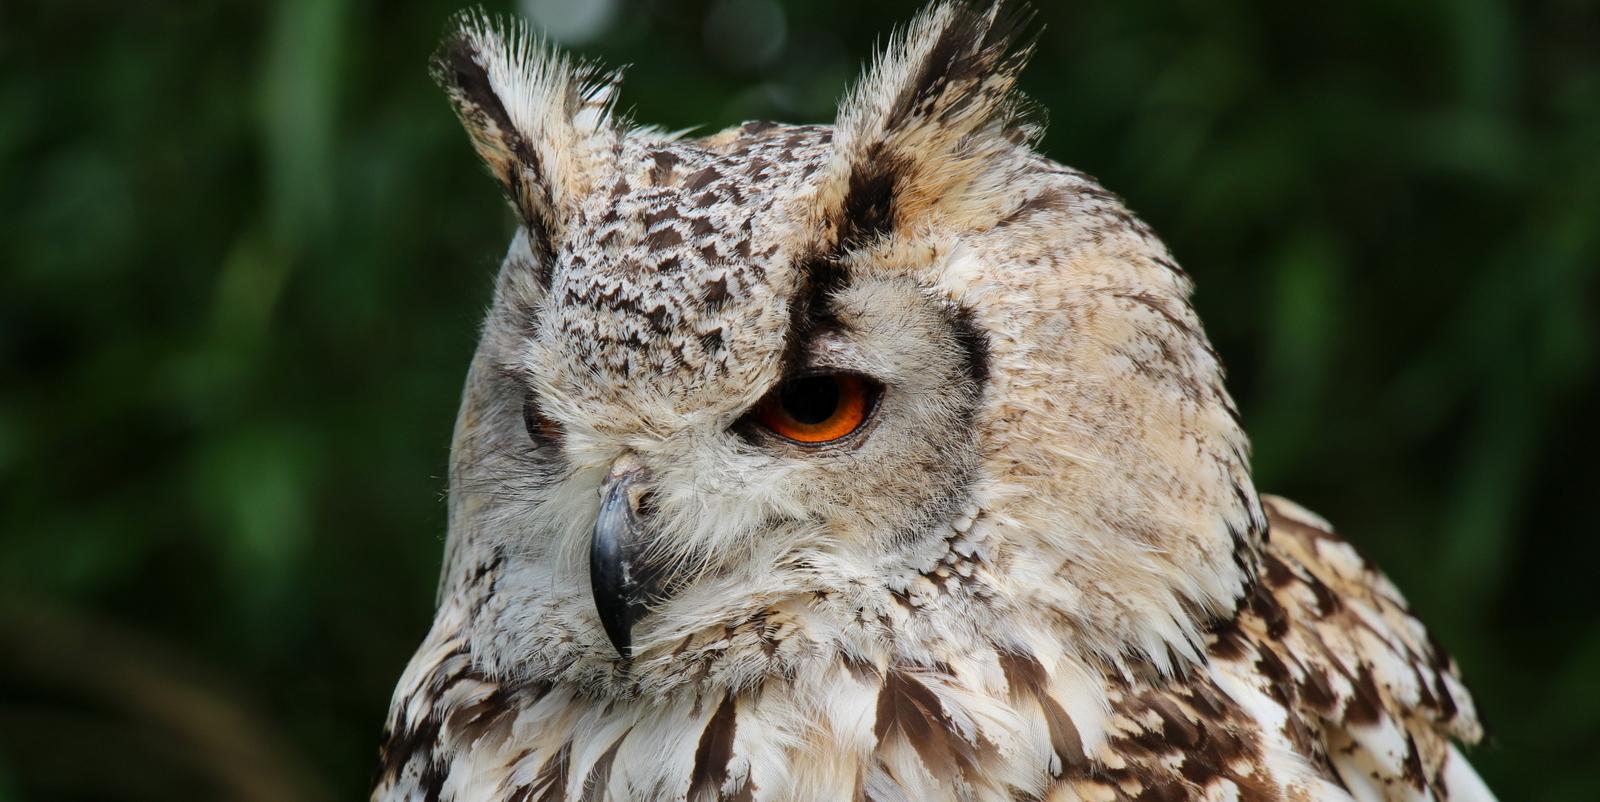 Falconry owl